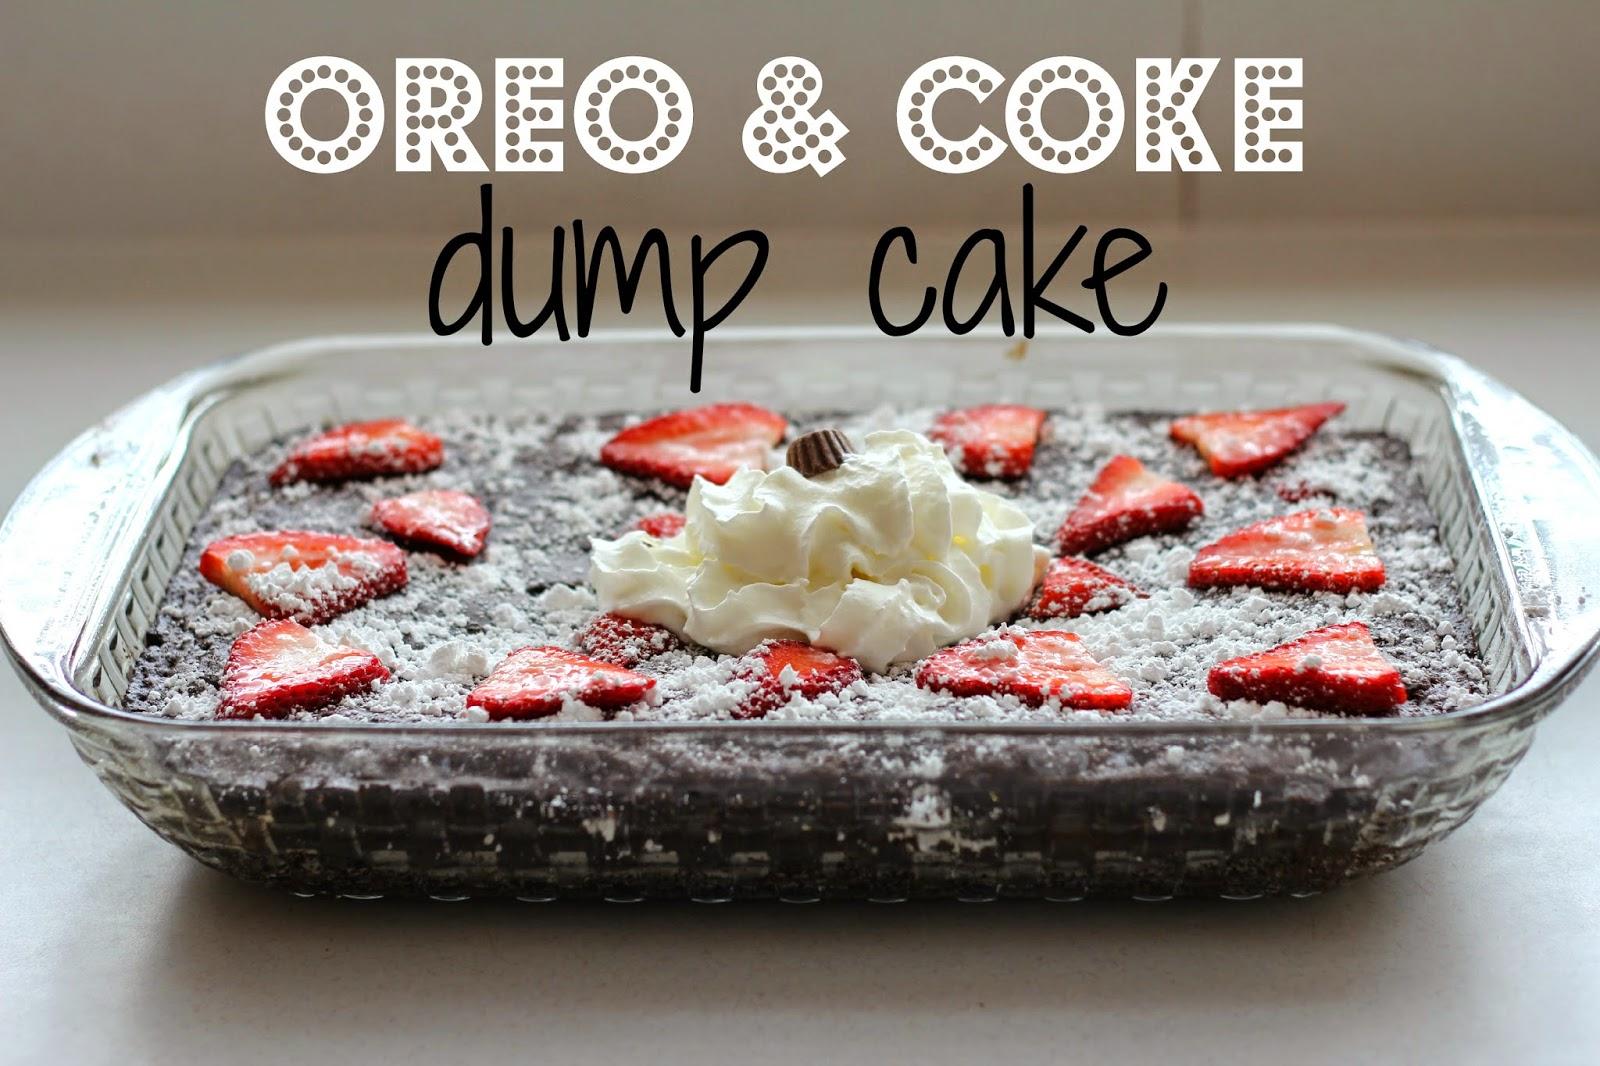 Potluck Recipes - Oreo & coke dump cake